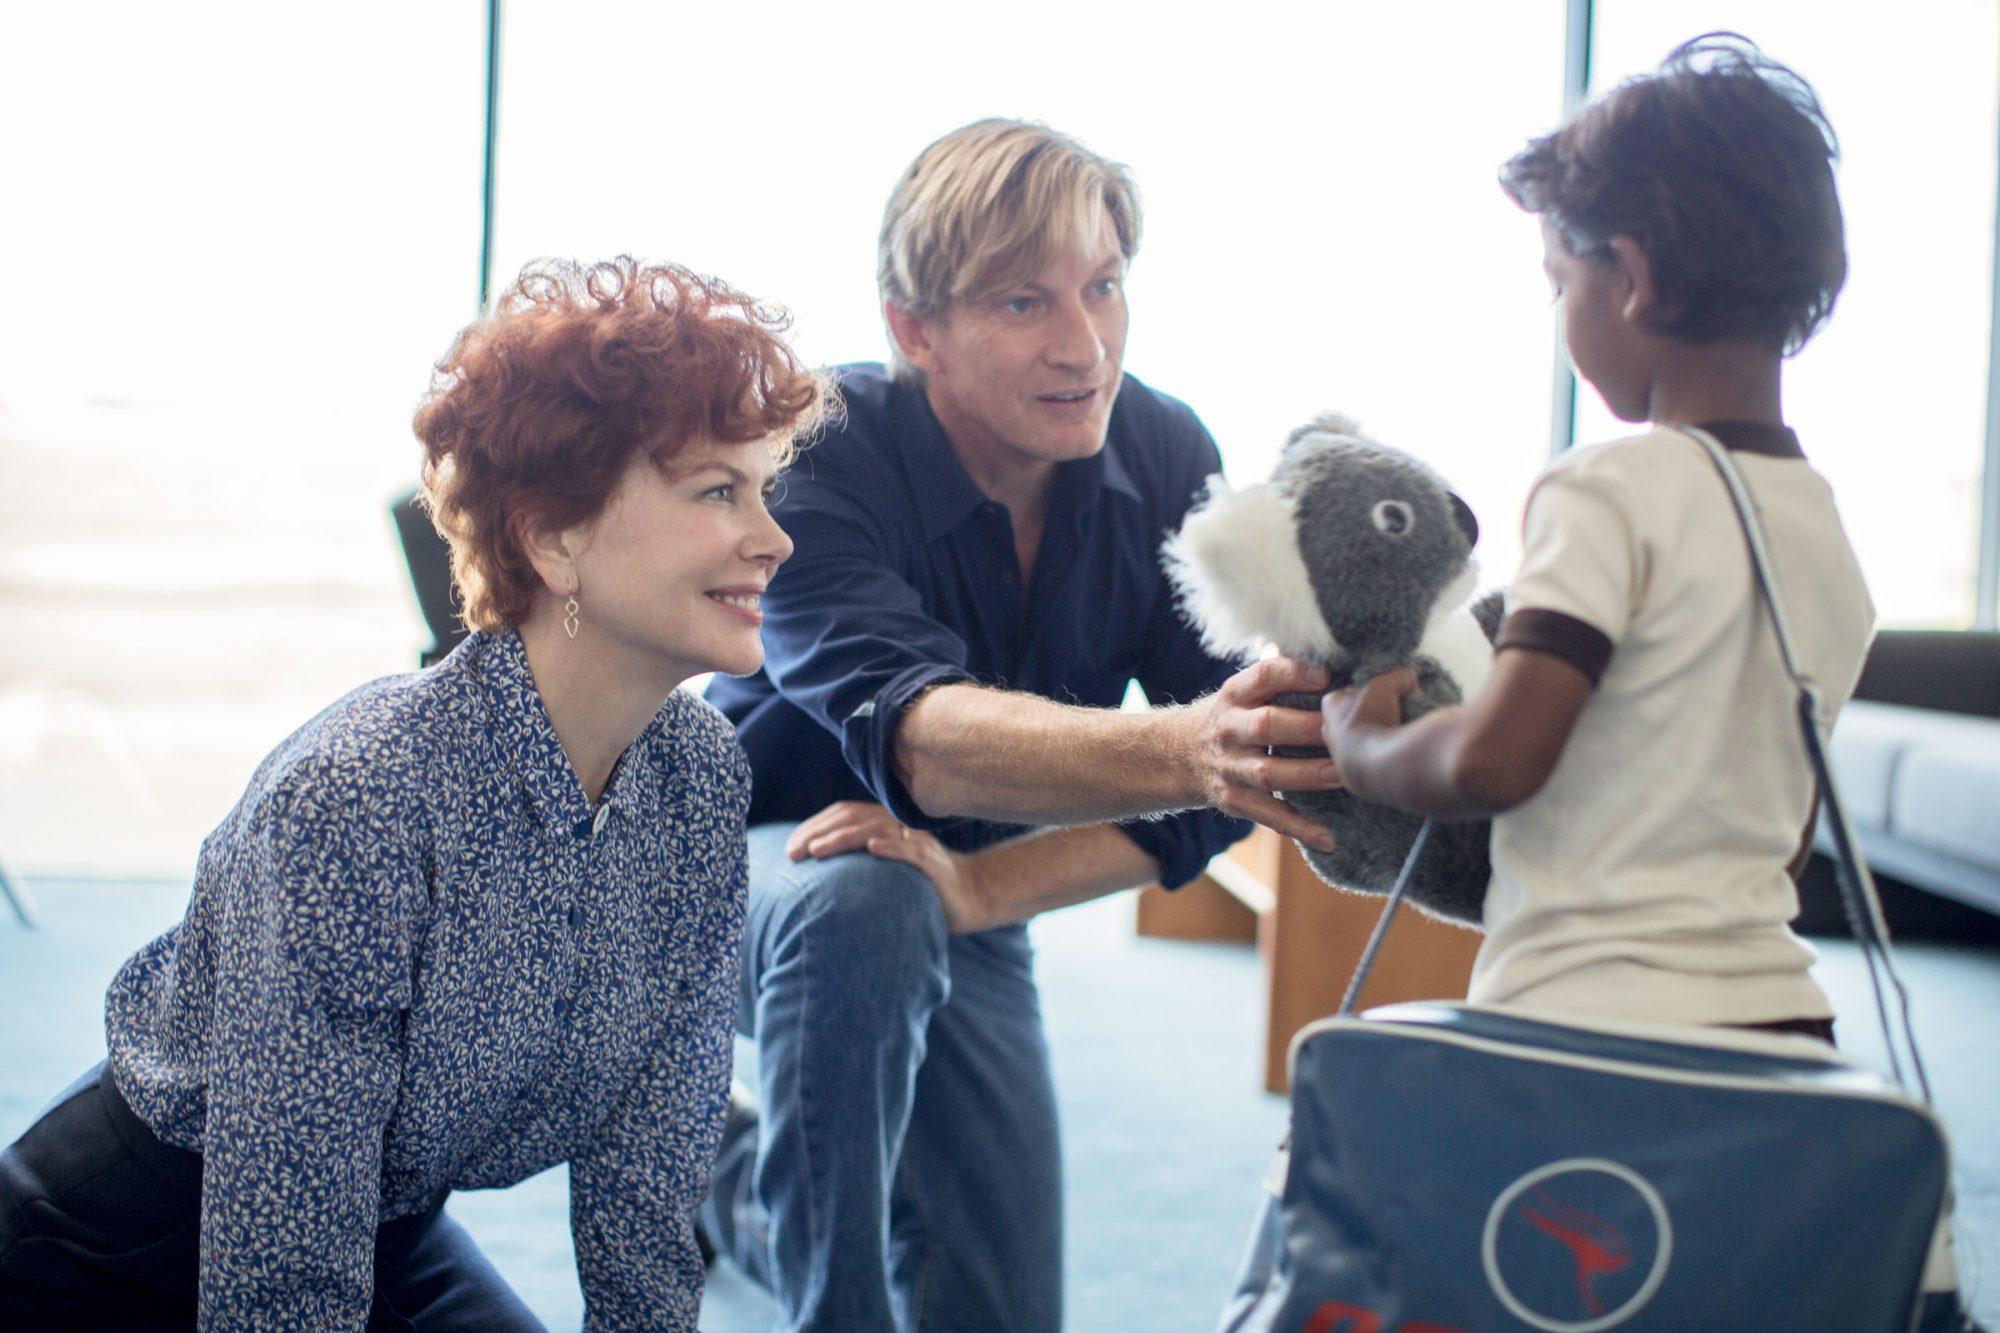 Lion (2016) Nicole Kidman, David Wenham and Sunny Pawar